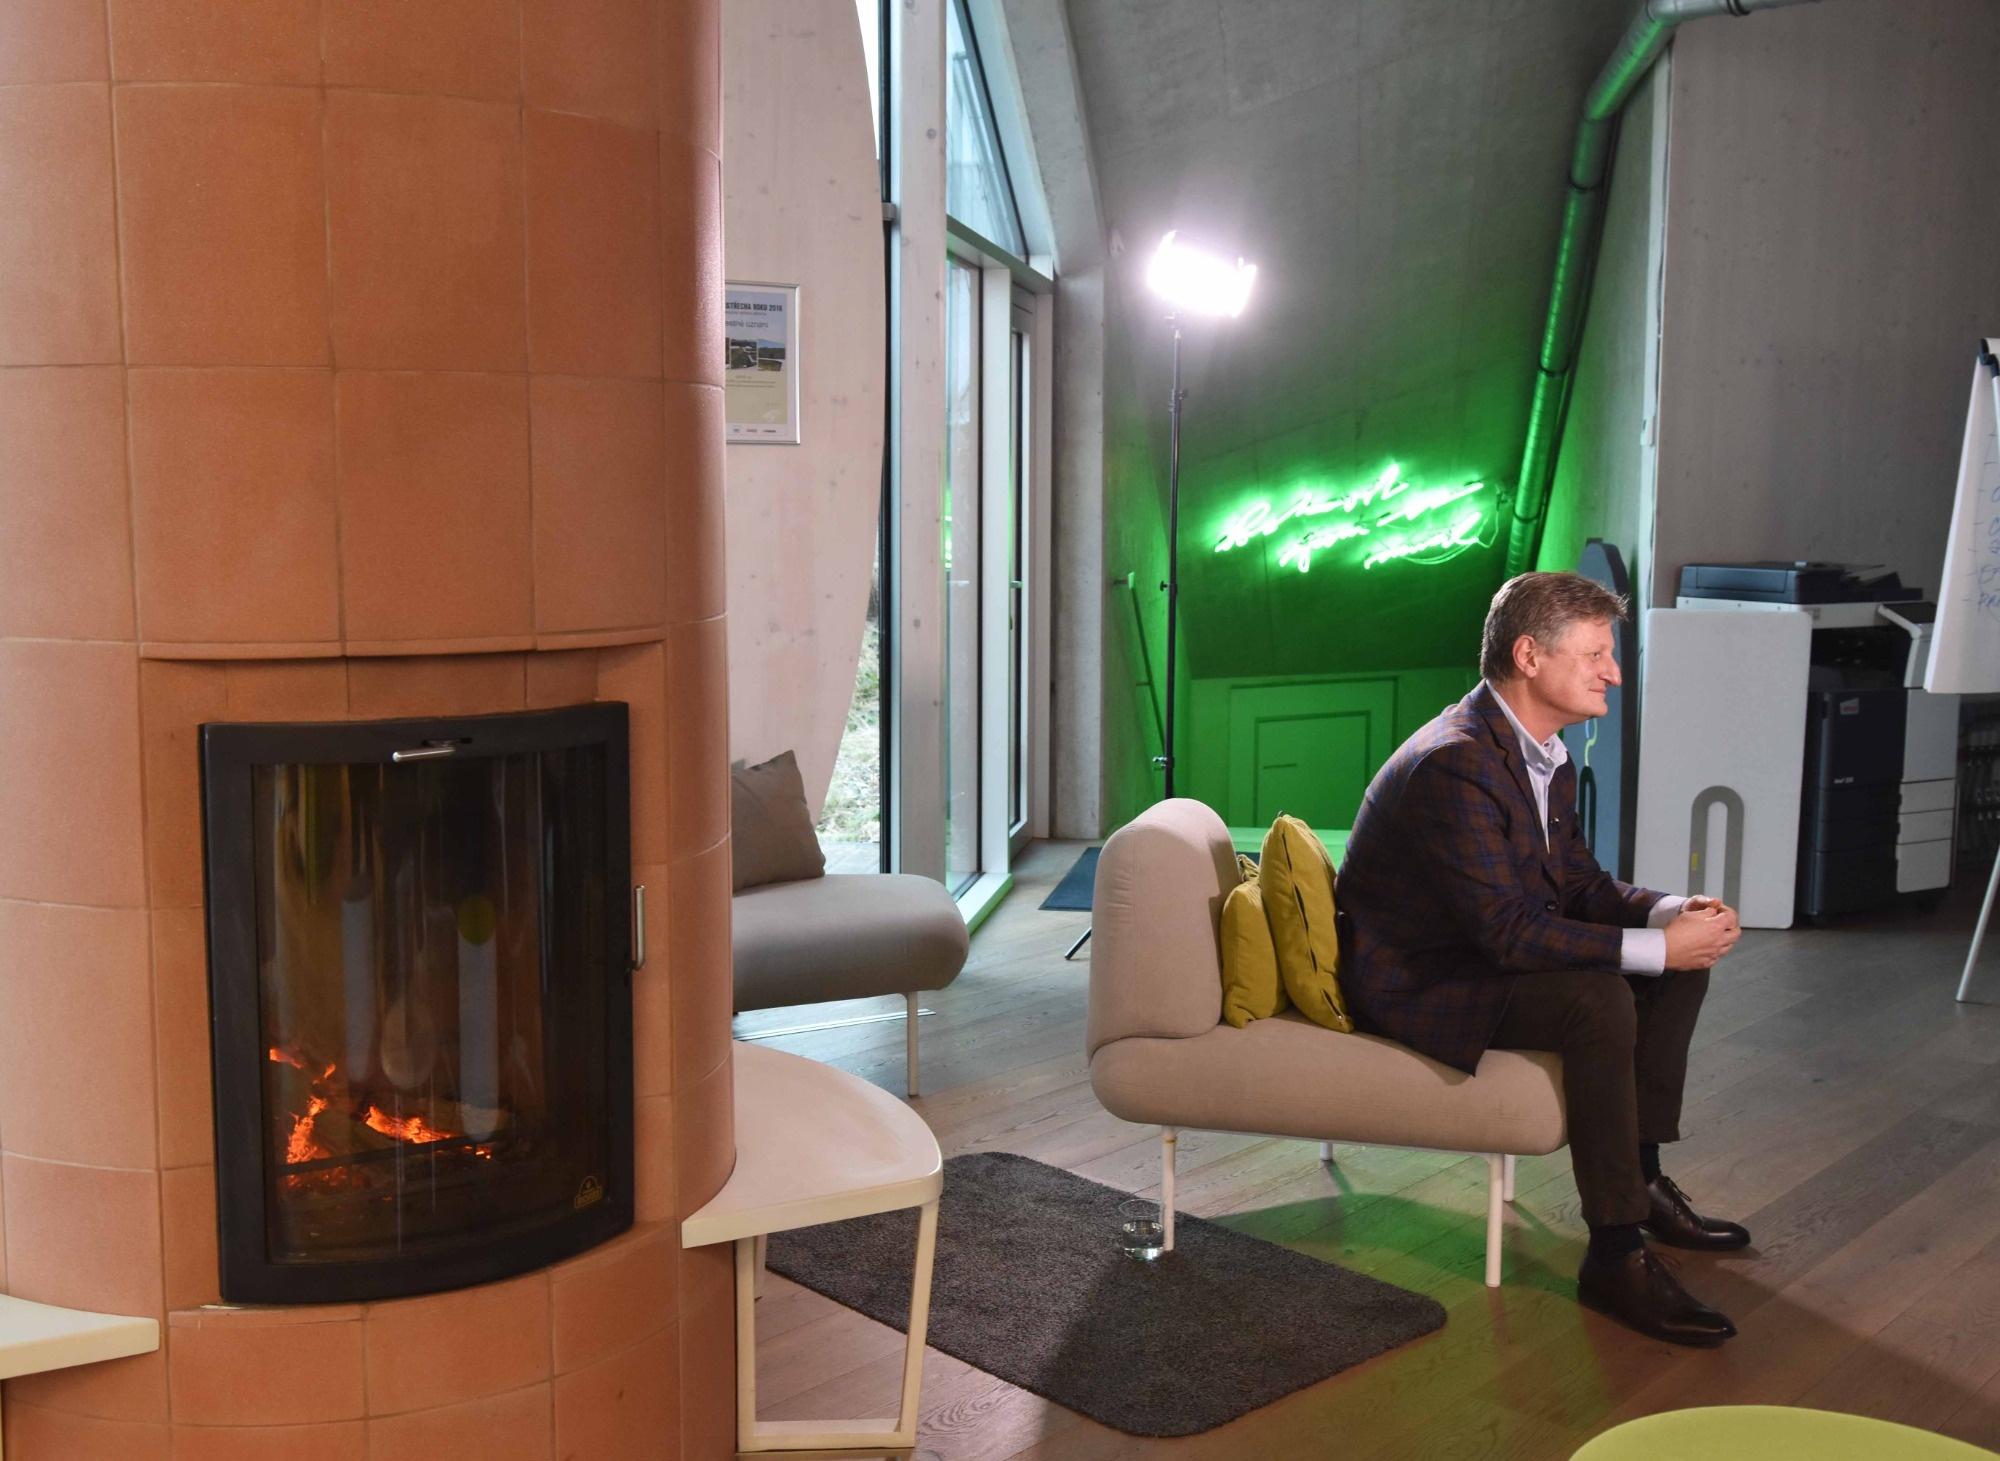 Revolučná zelená hala spoločnosti LIKO-S v magazíne Víkend